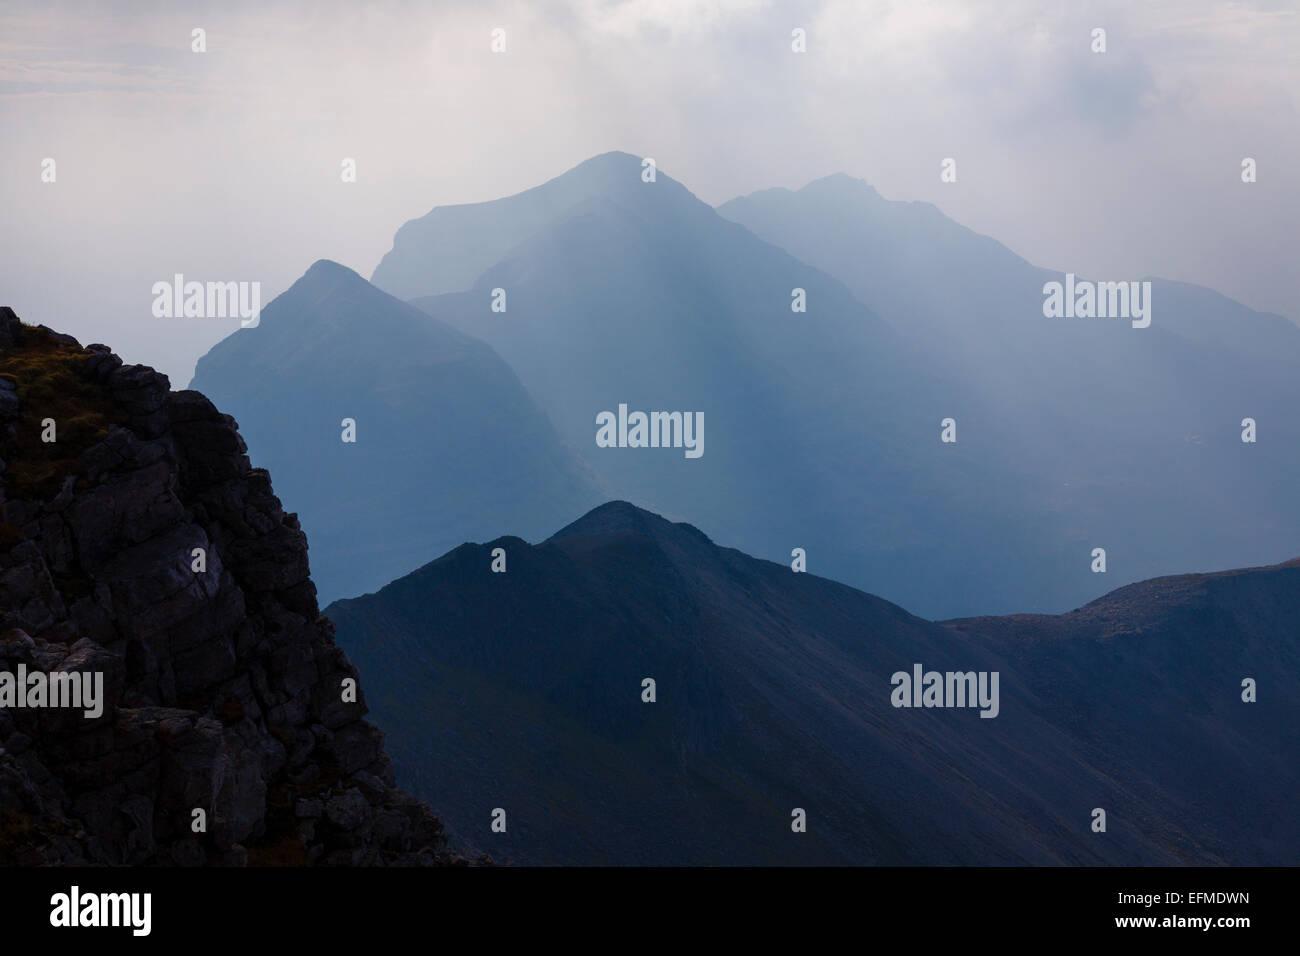 Gipfelns hinter der eindrucksvollen Bergrücken Beinn Eighe droht. Stockbild